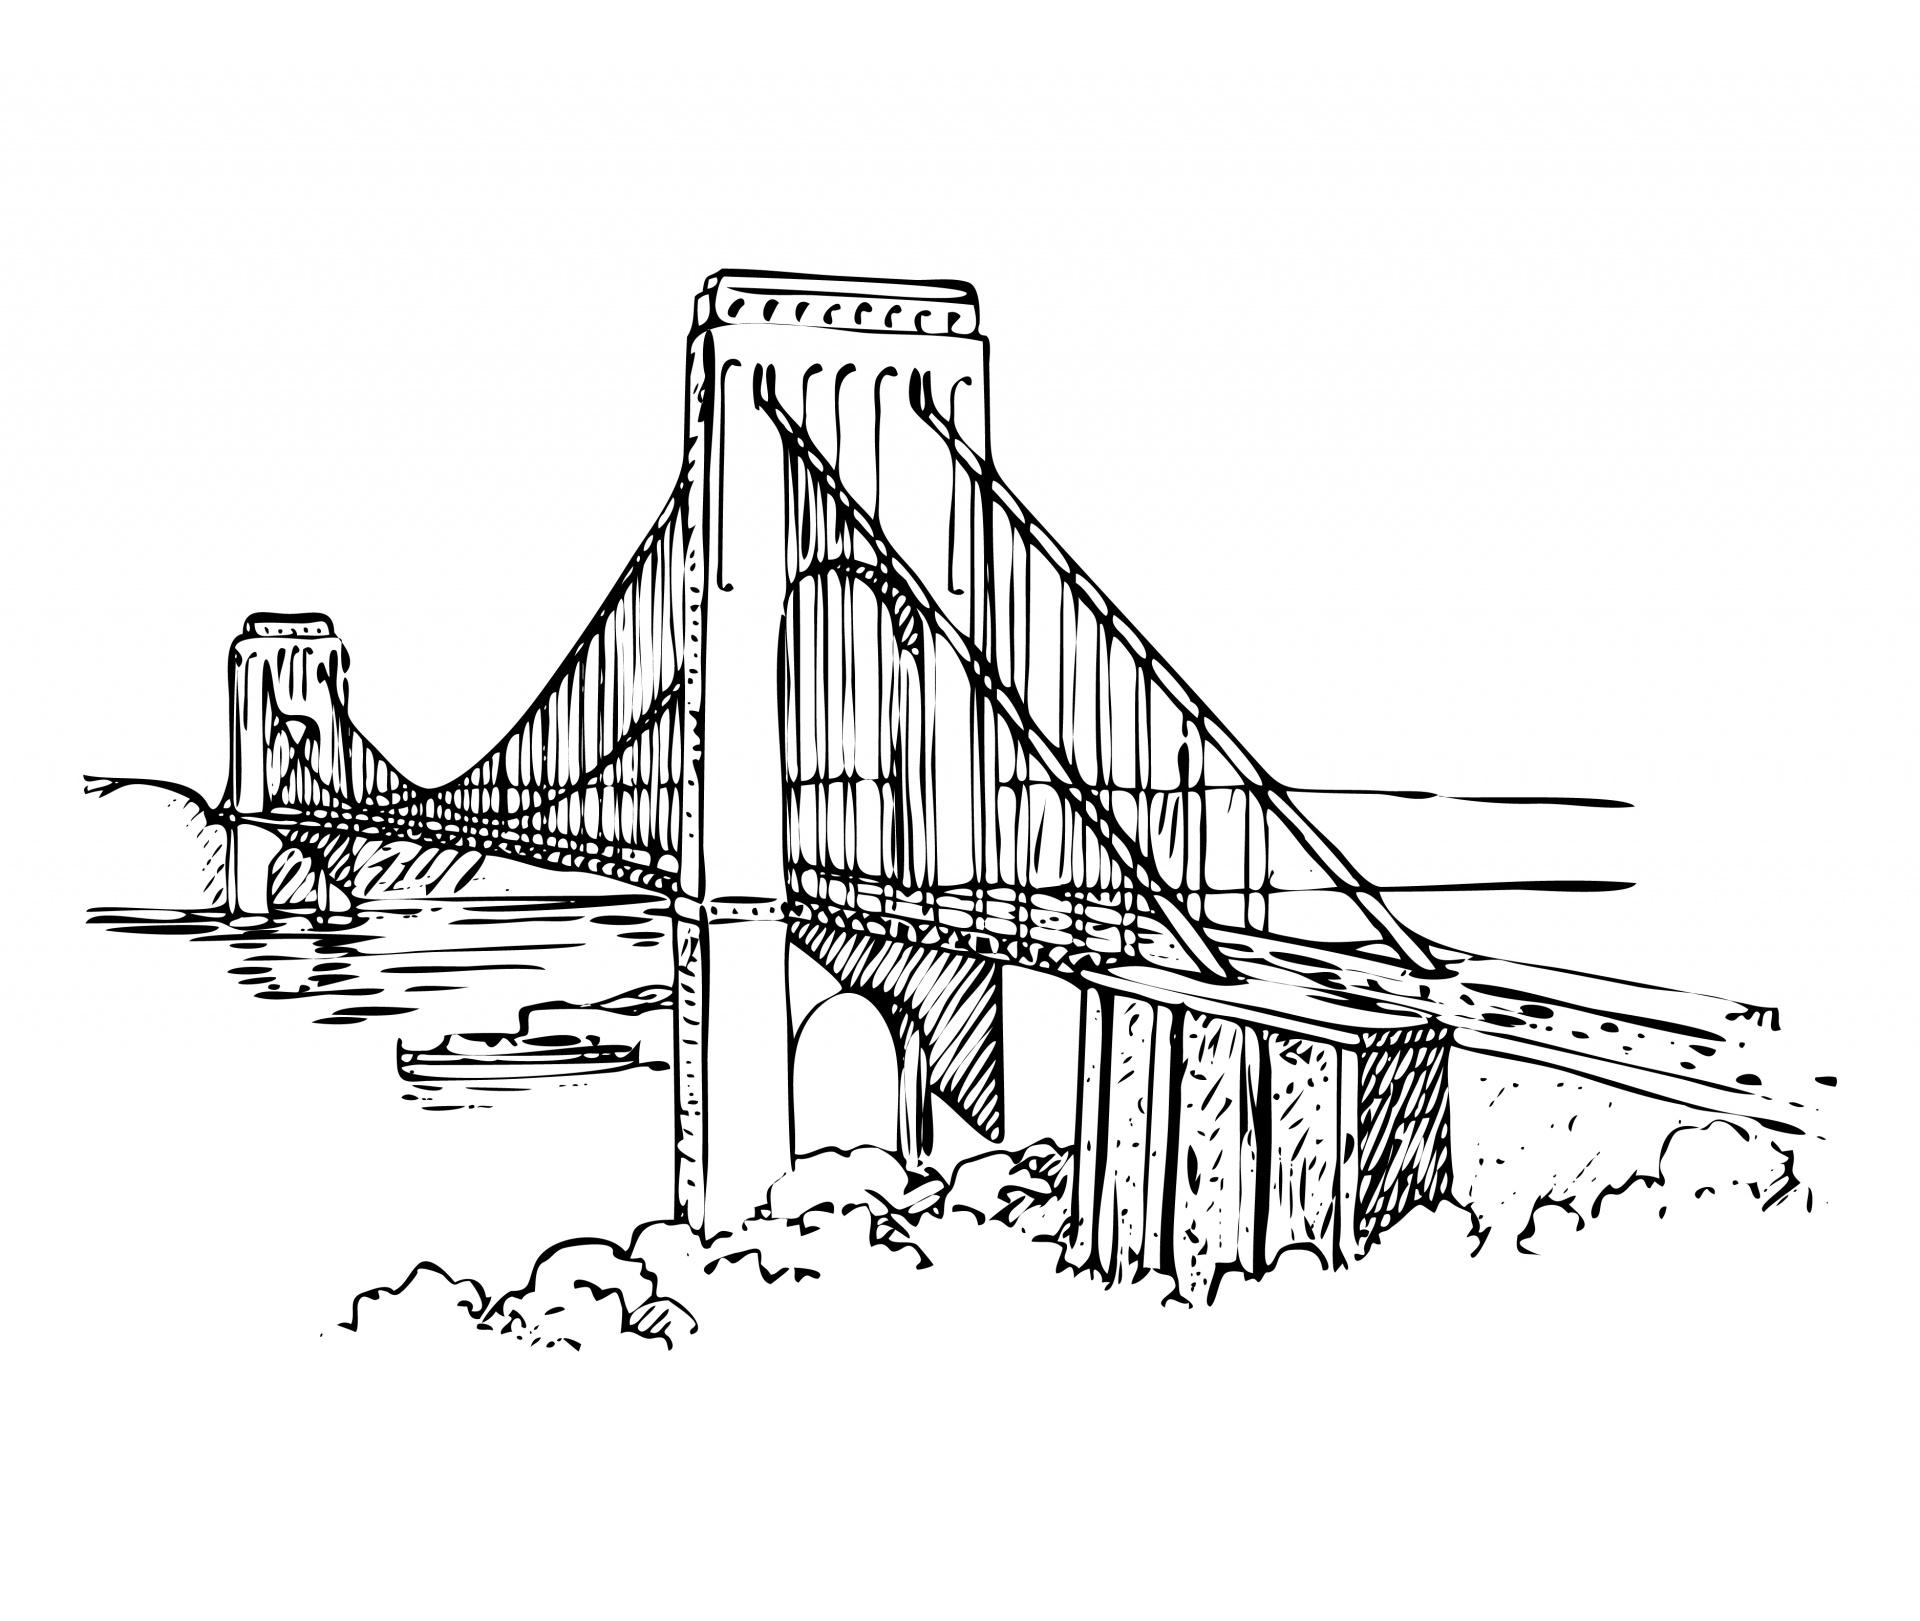 Suspension Bridge Illustration Free Stock Photo